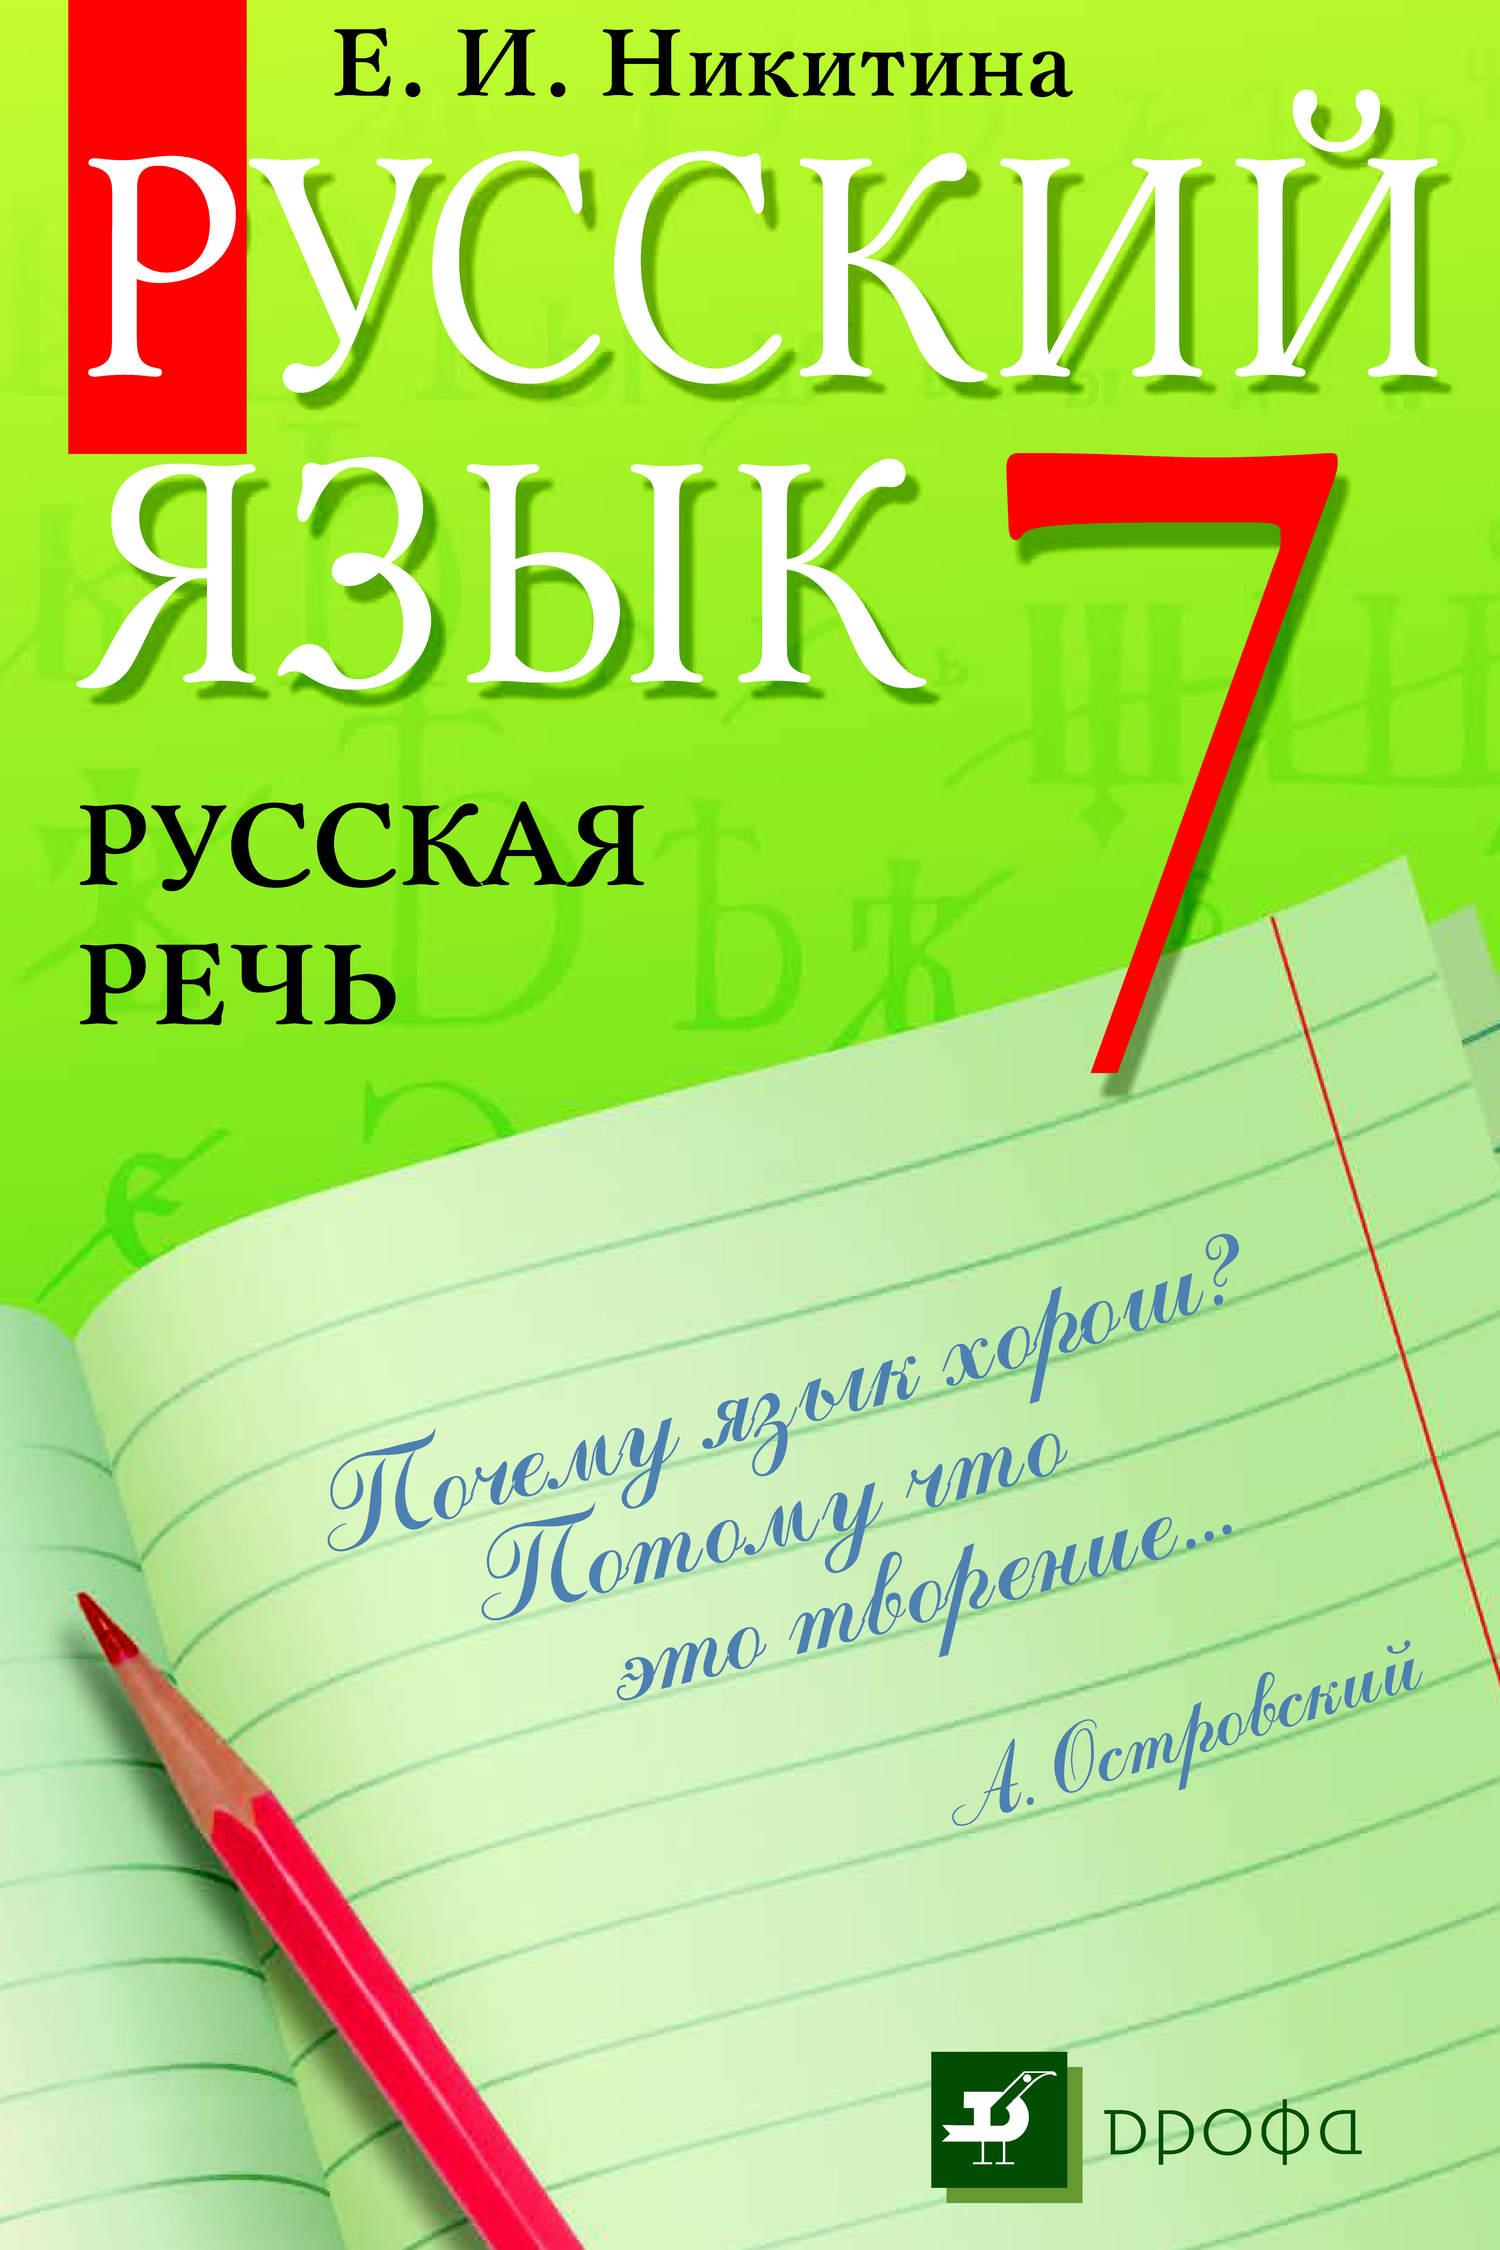 Гдз русская речь 6 класс дрофа